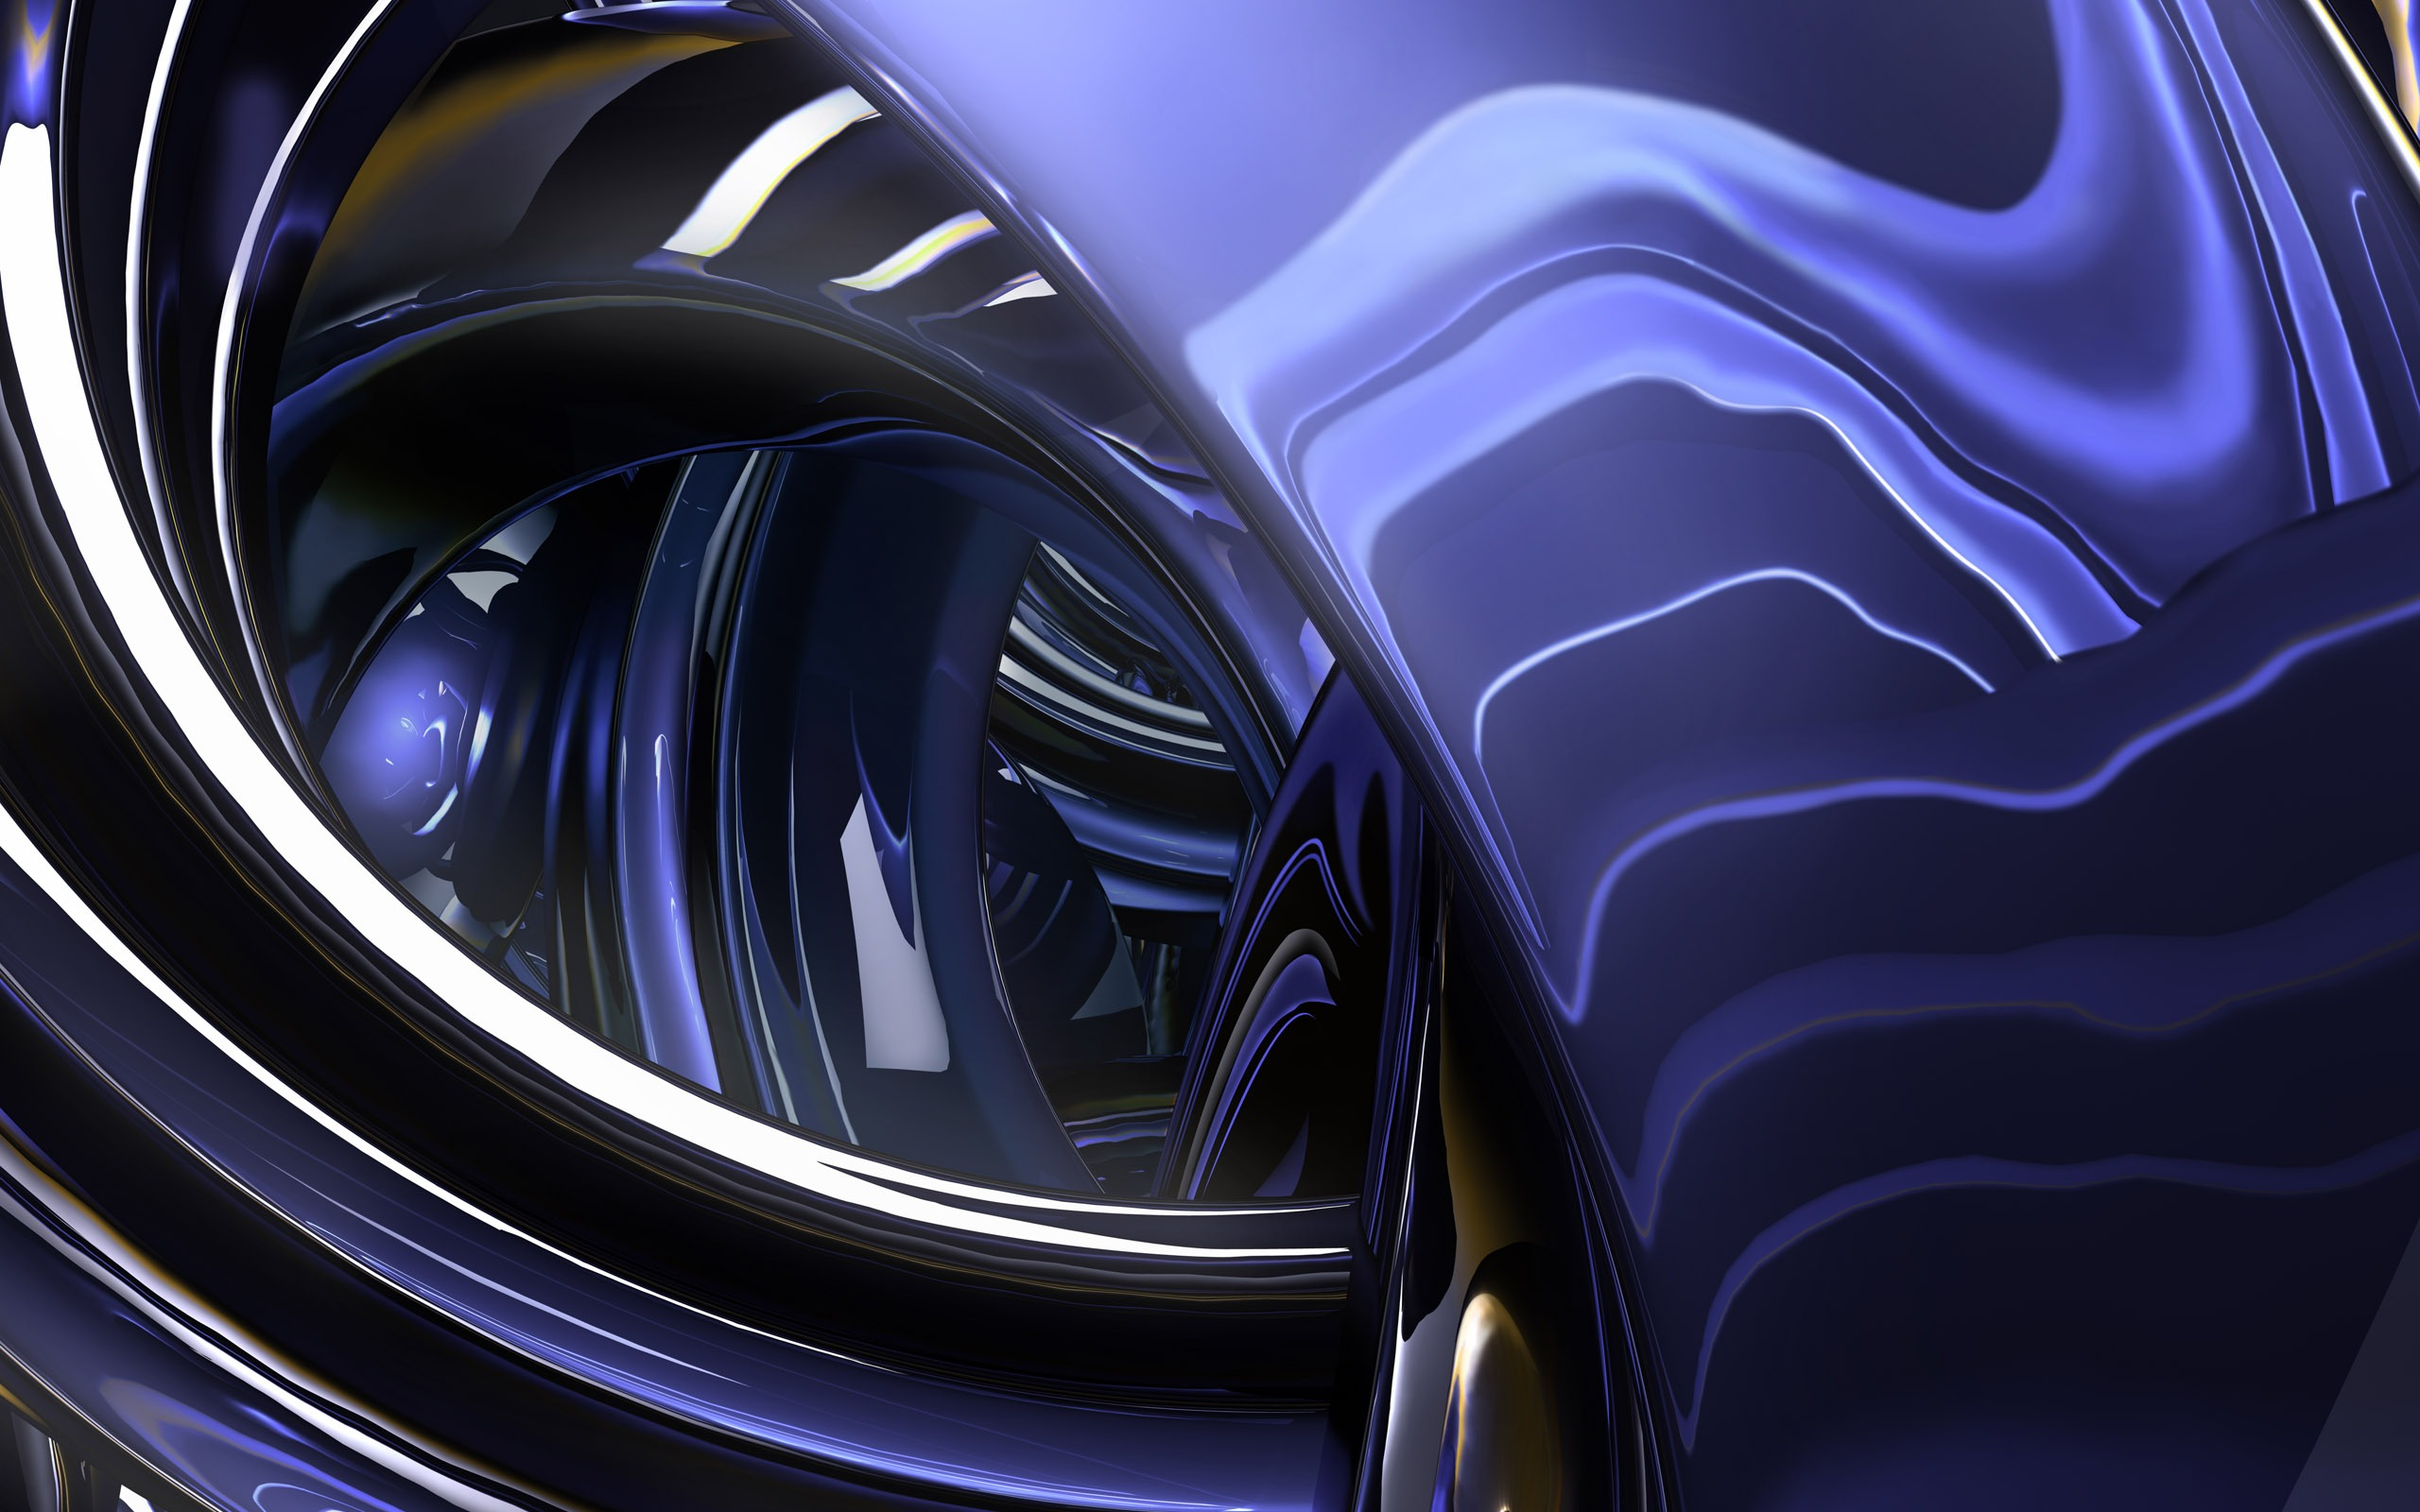 3D Art HD Wallpaper | Background Image | 2560x1600 | ID:105569 - Wallpaper Abyss